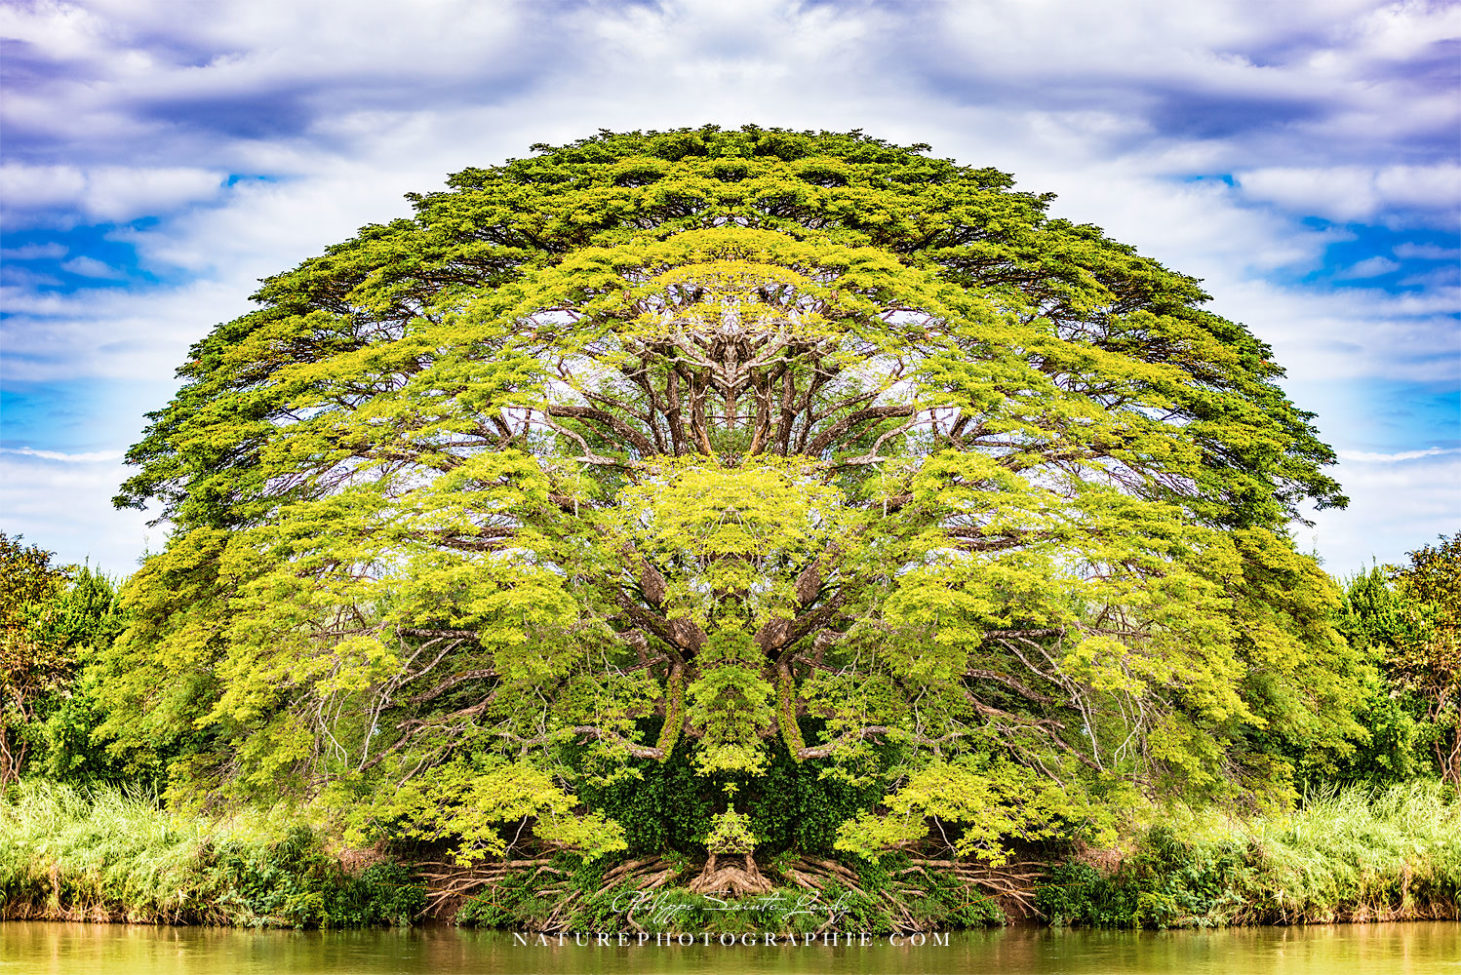 The Majestic Tree